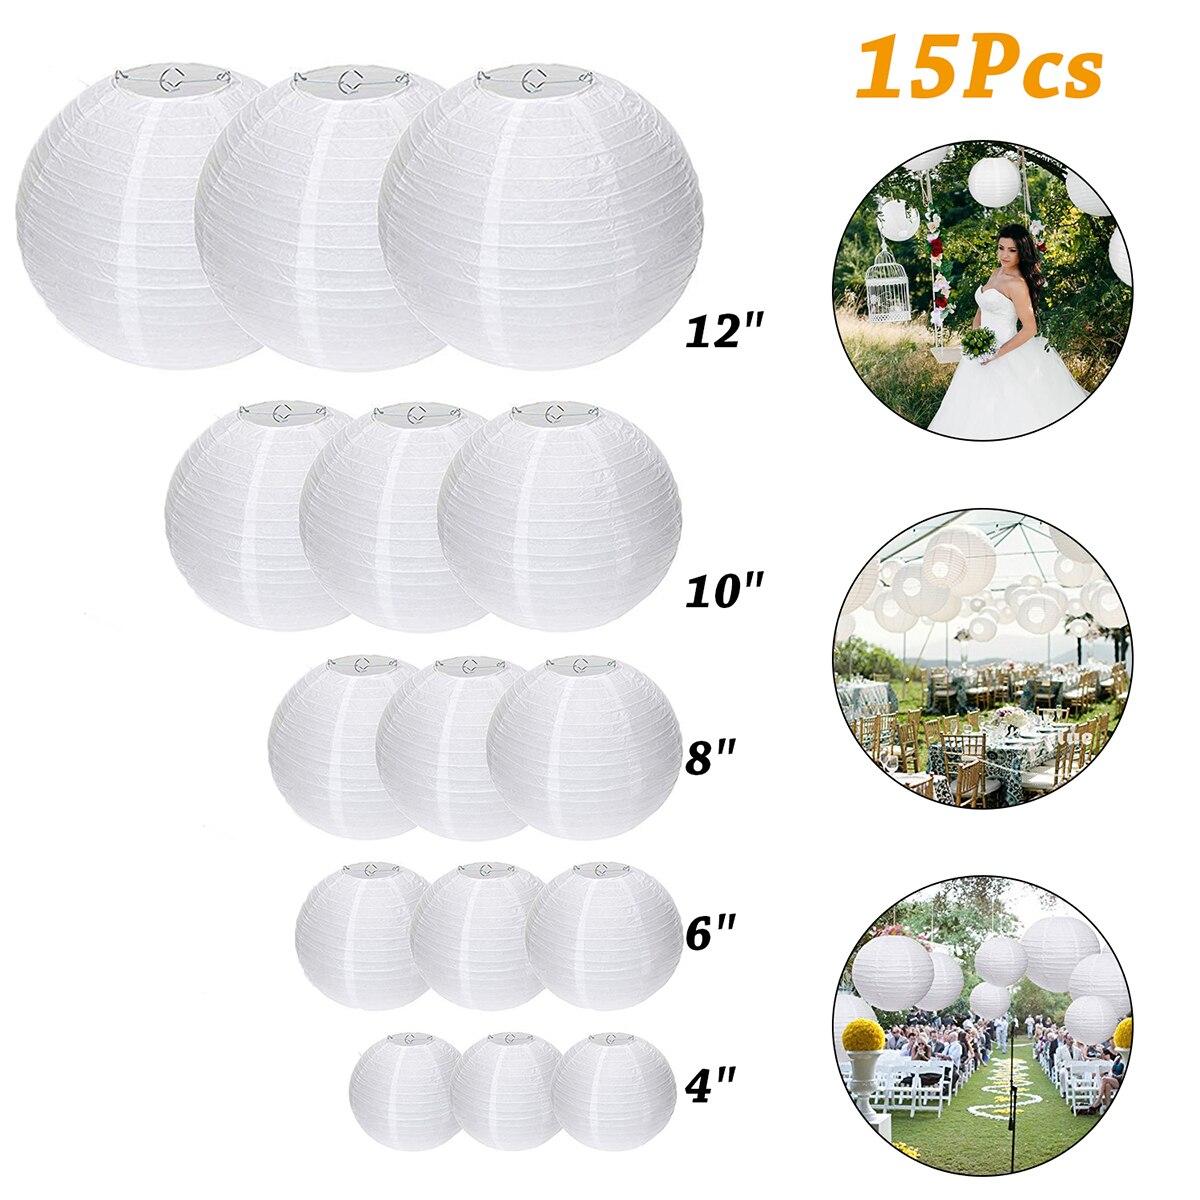 15pcs/Lot 4-12 Inch Mix Size Chinese Paper Ball Lampion Hanging White Wedding Decoration Paper Lanterns Lampshade Party Decor